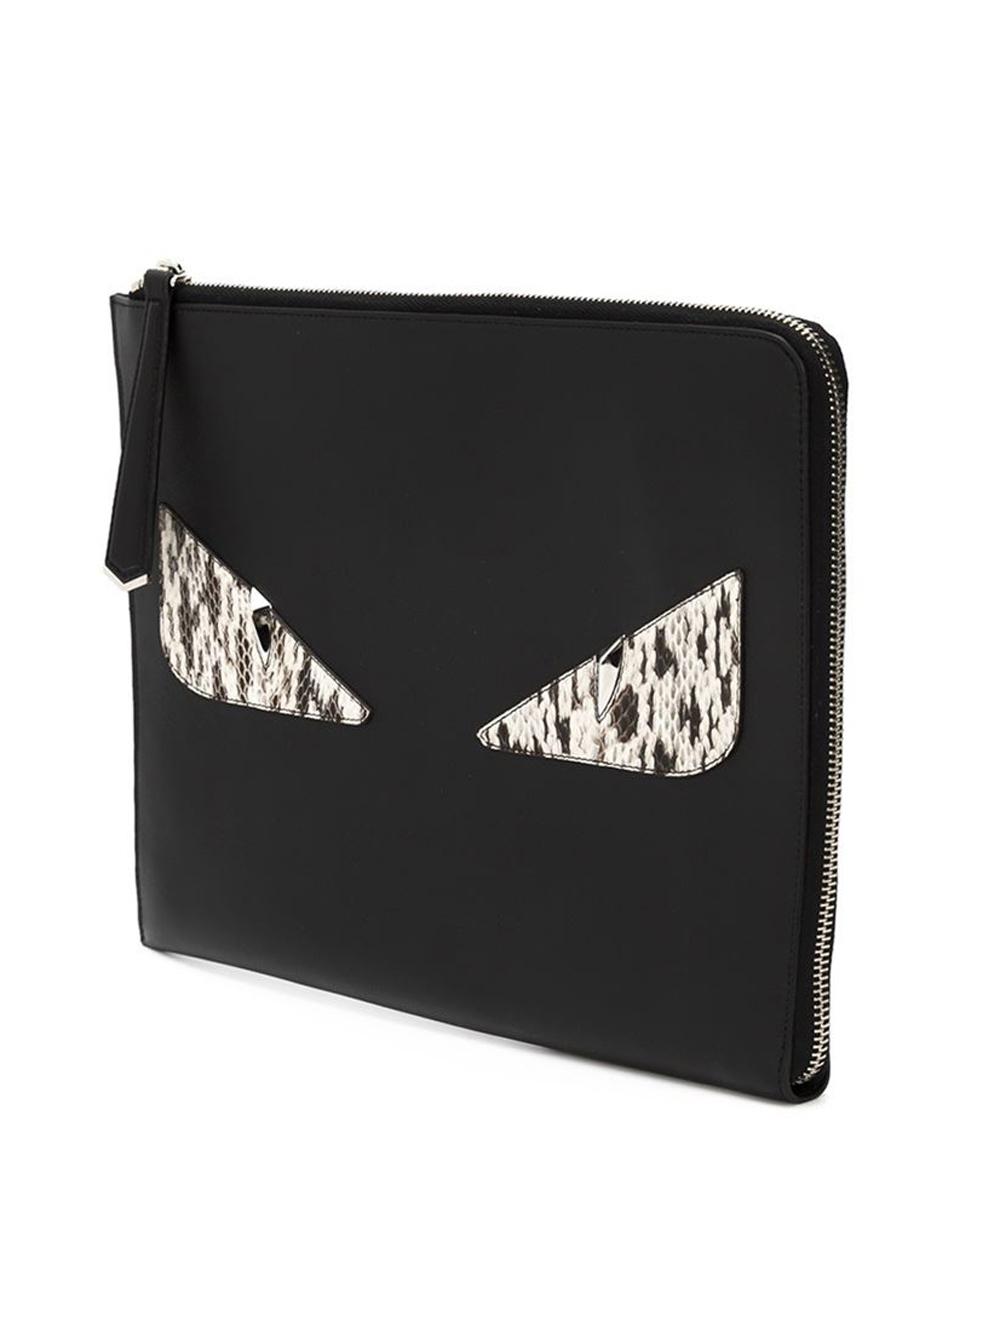 Lyst - Fendi Bag Bugs Clutch in Black be74f90708540